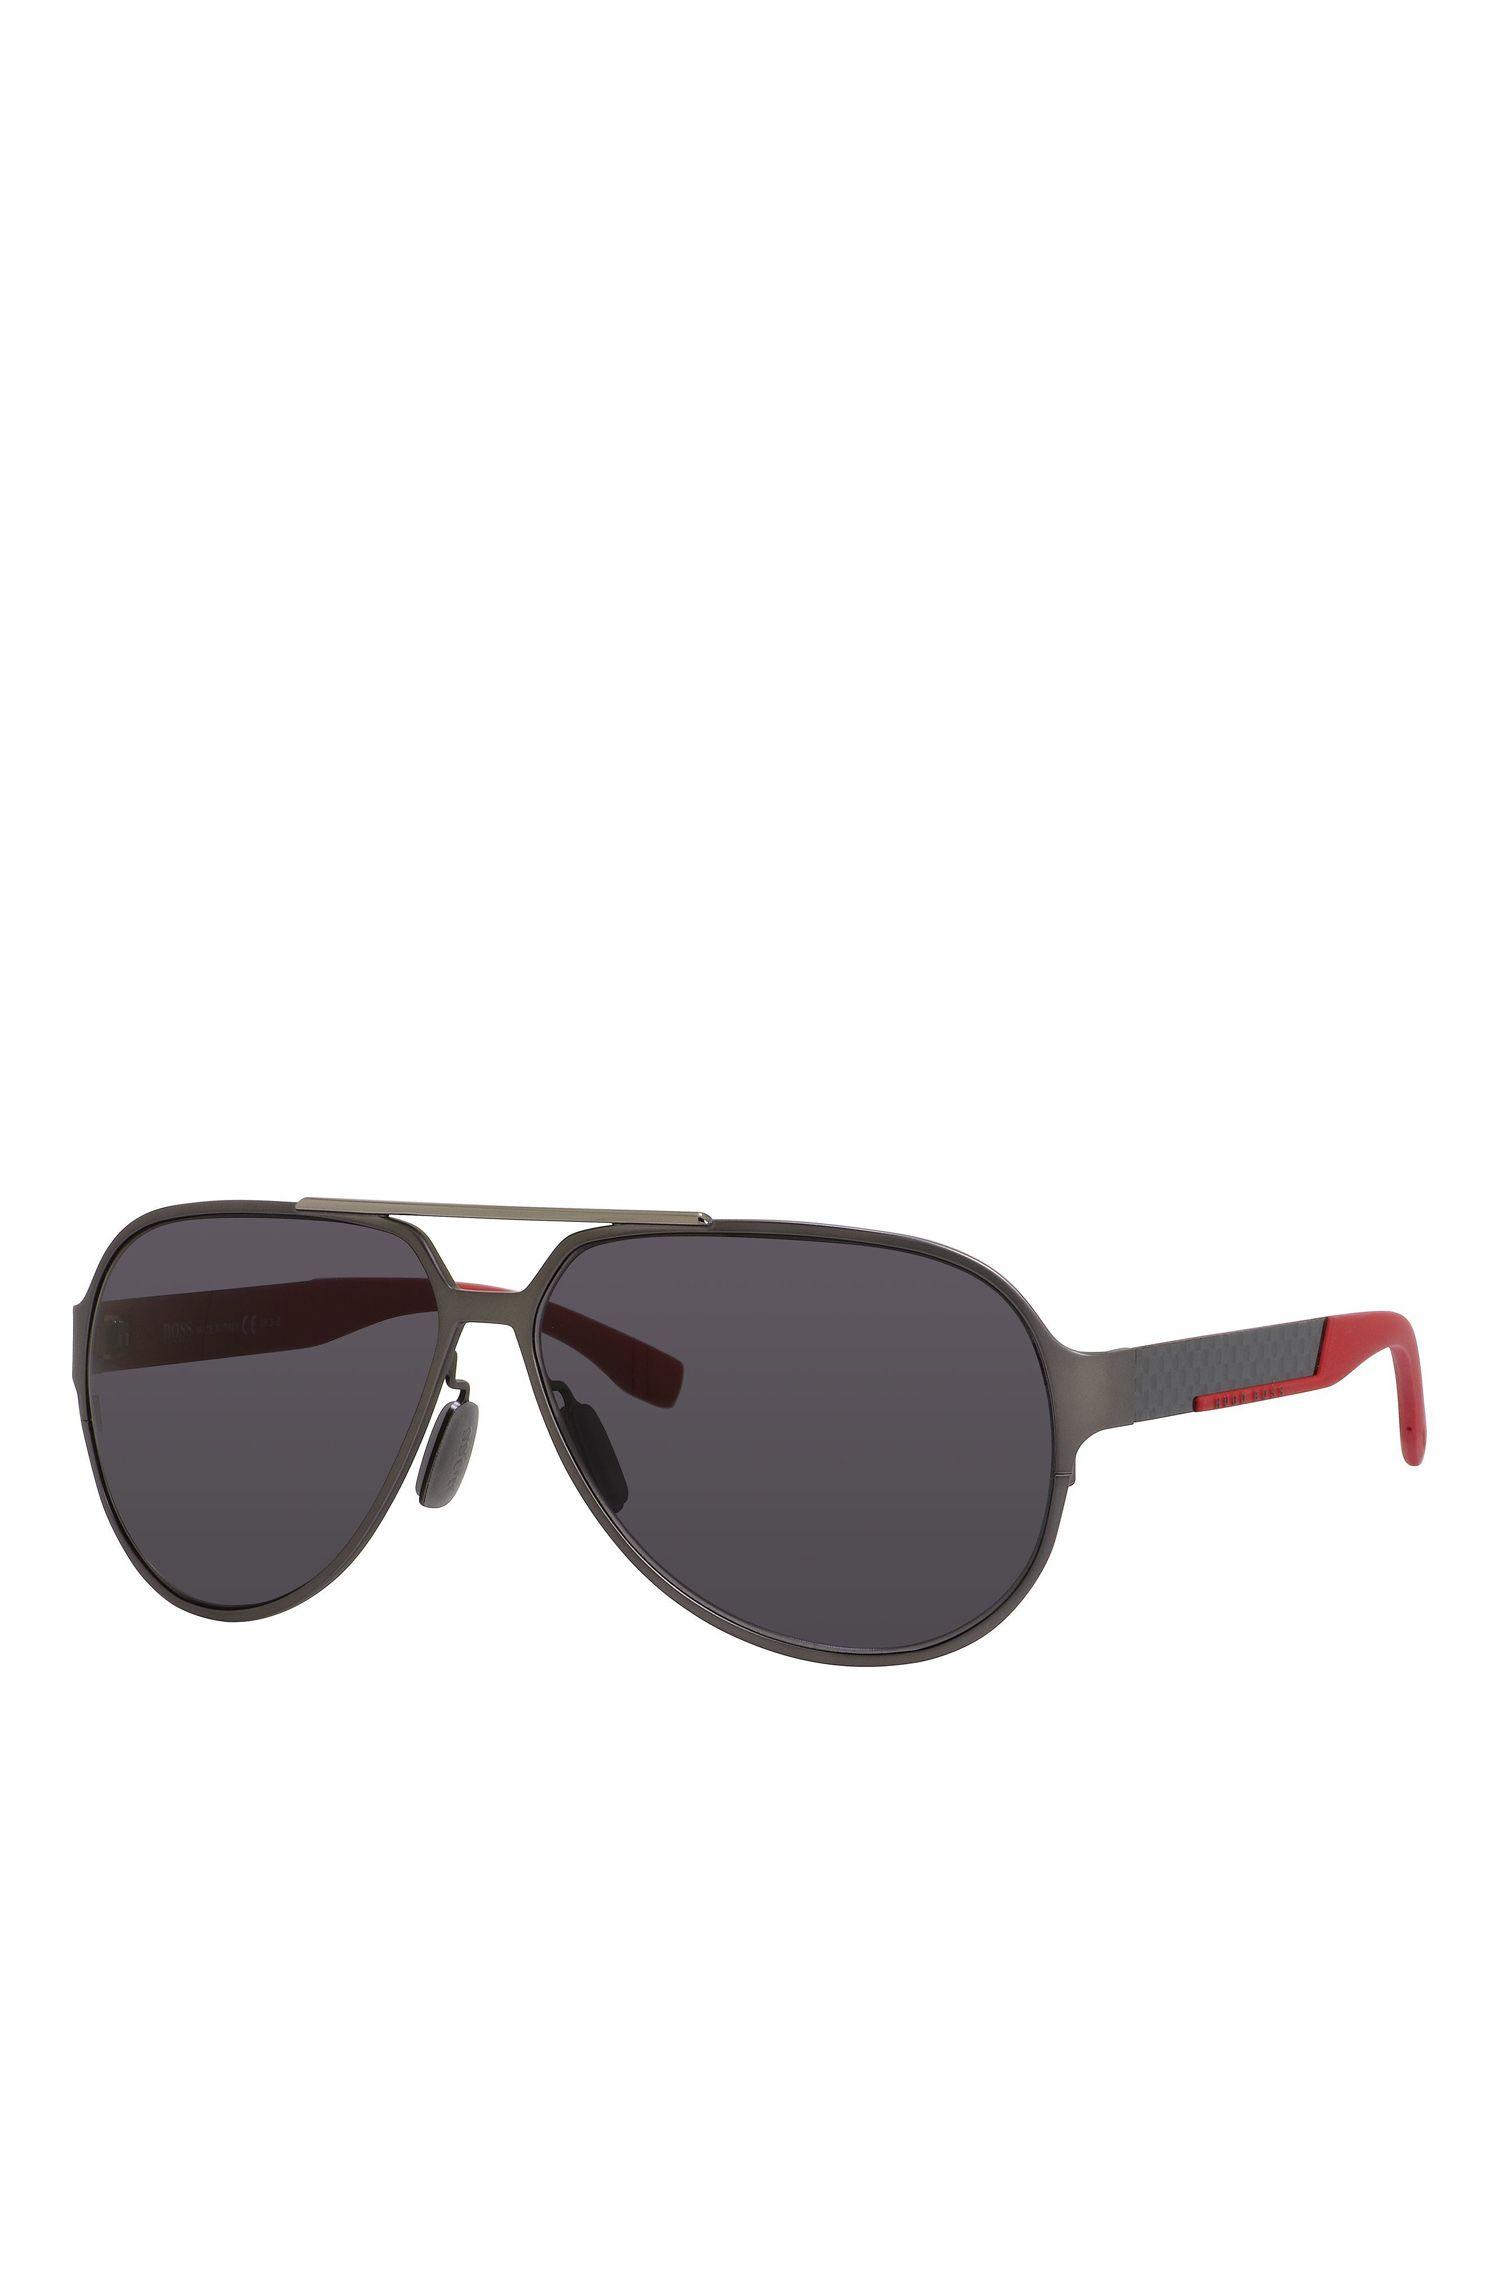 Black Lens Carbon Fiber Aviator Sunglasses | BOSS 0669S